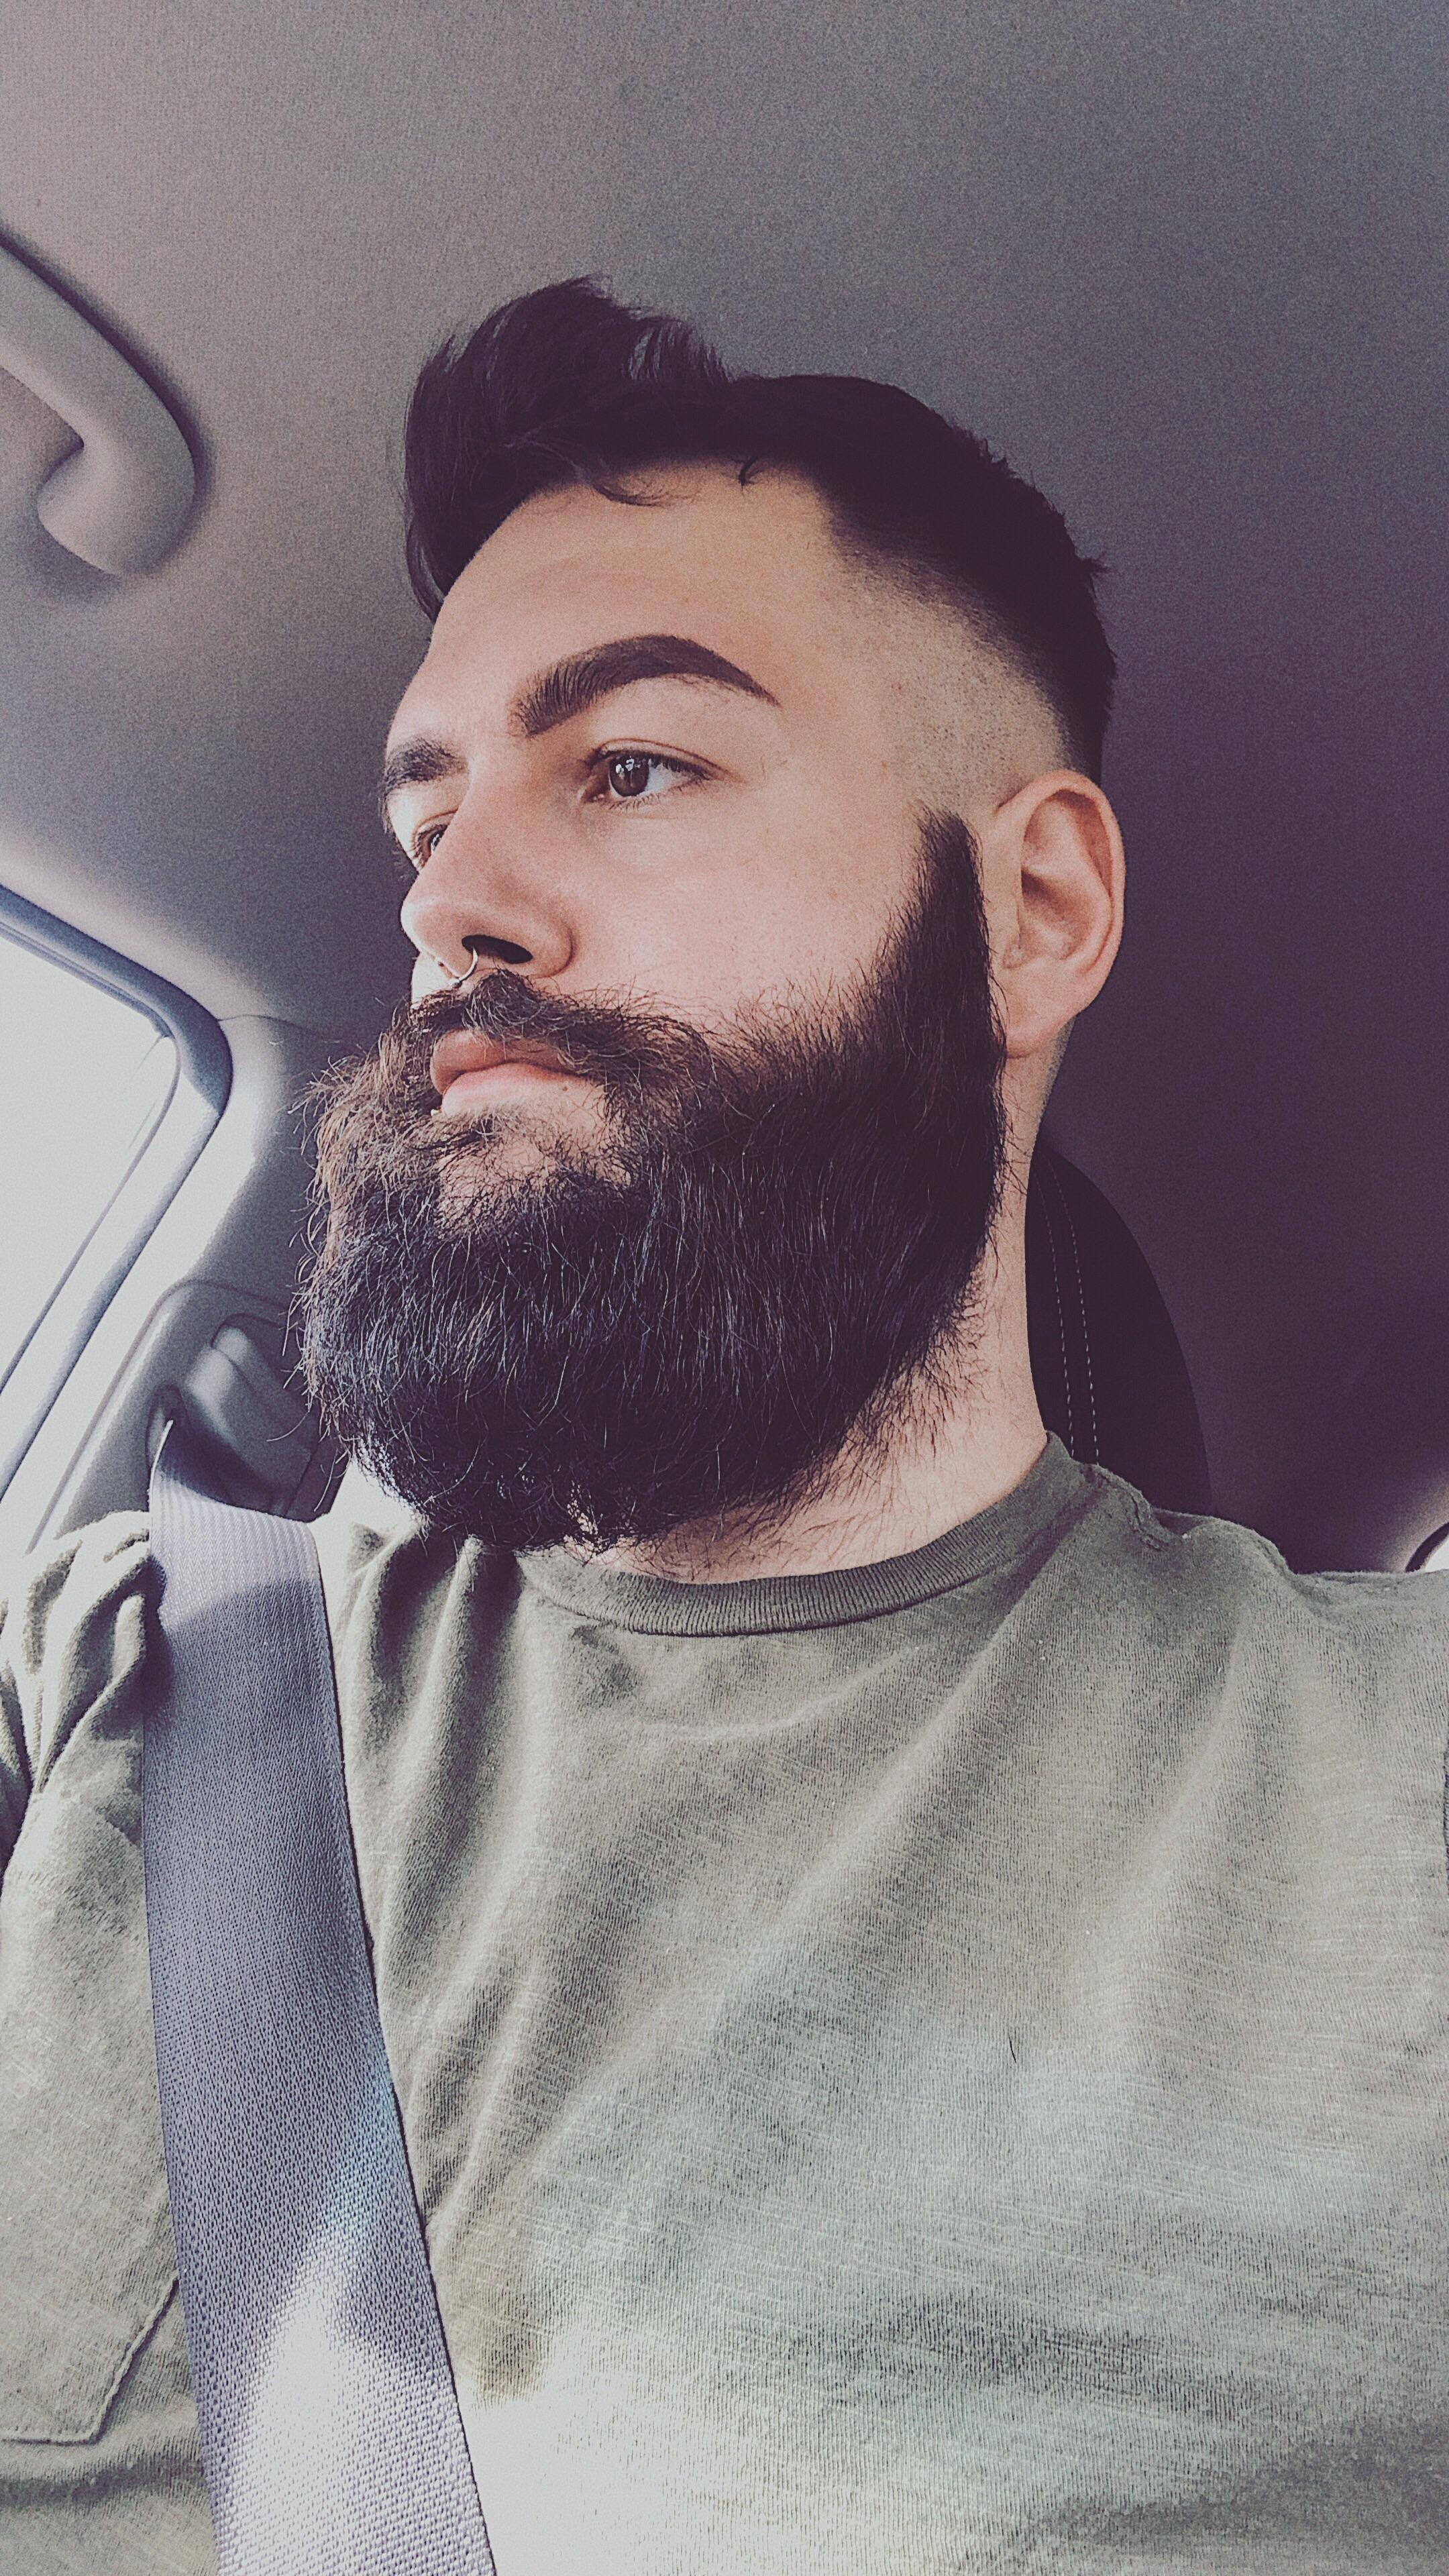 Fresh haircut men contrast from a fresh haircut makes the beard power up  full beard